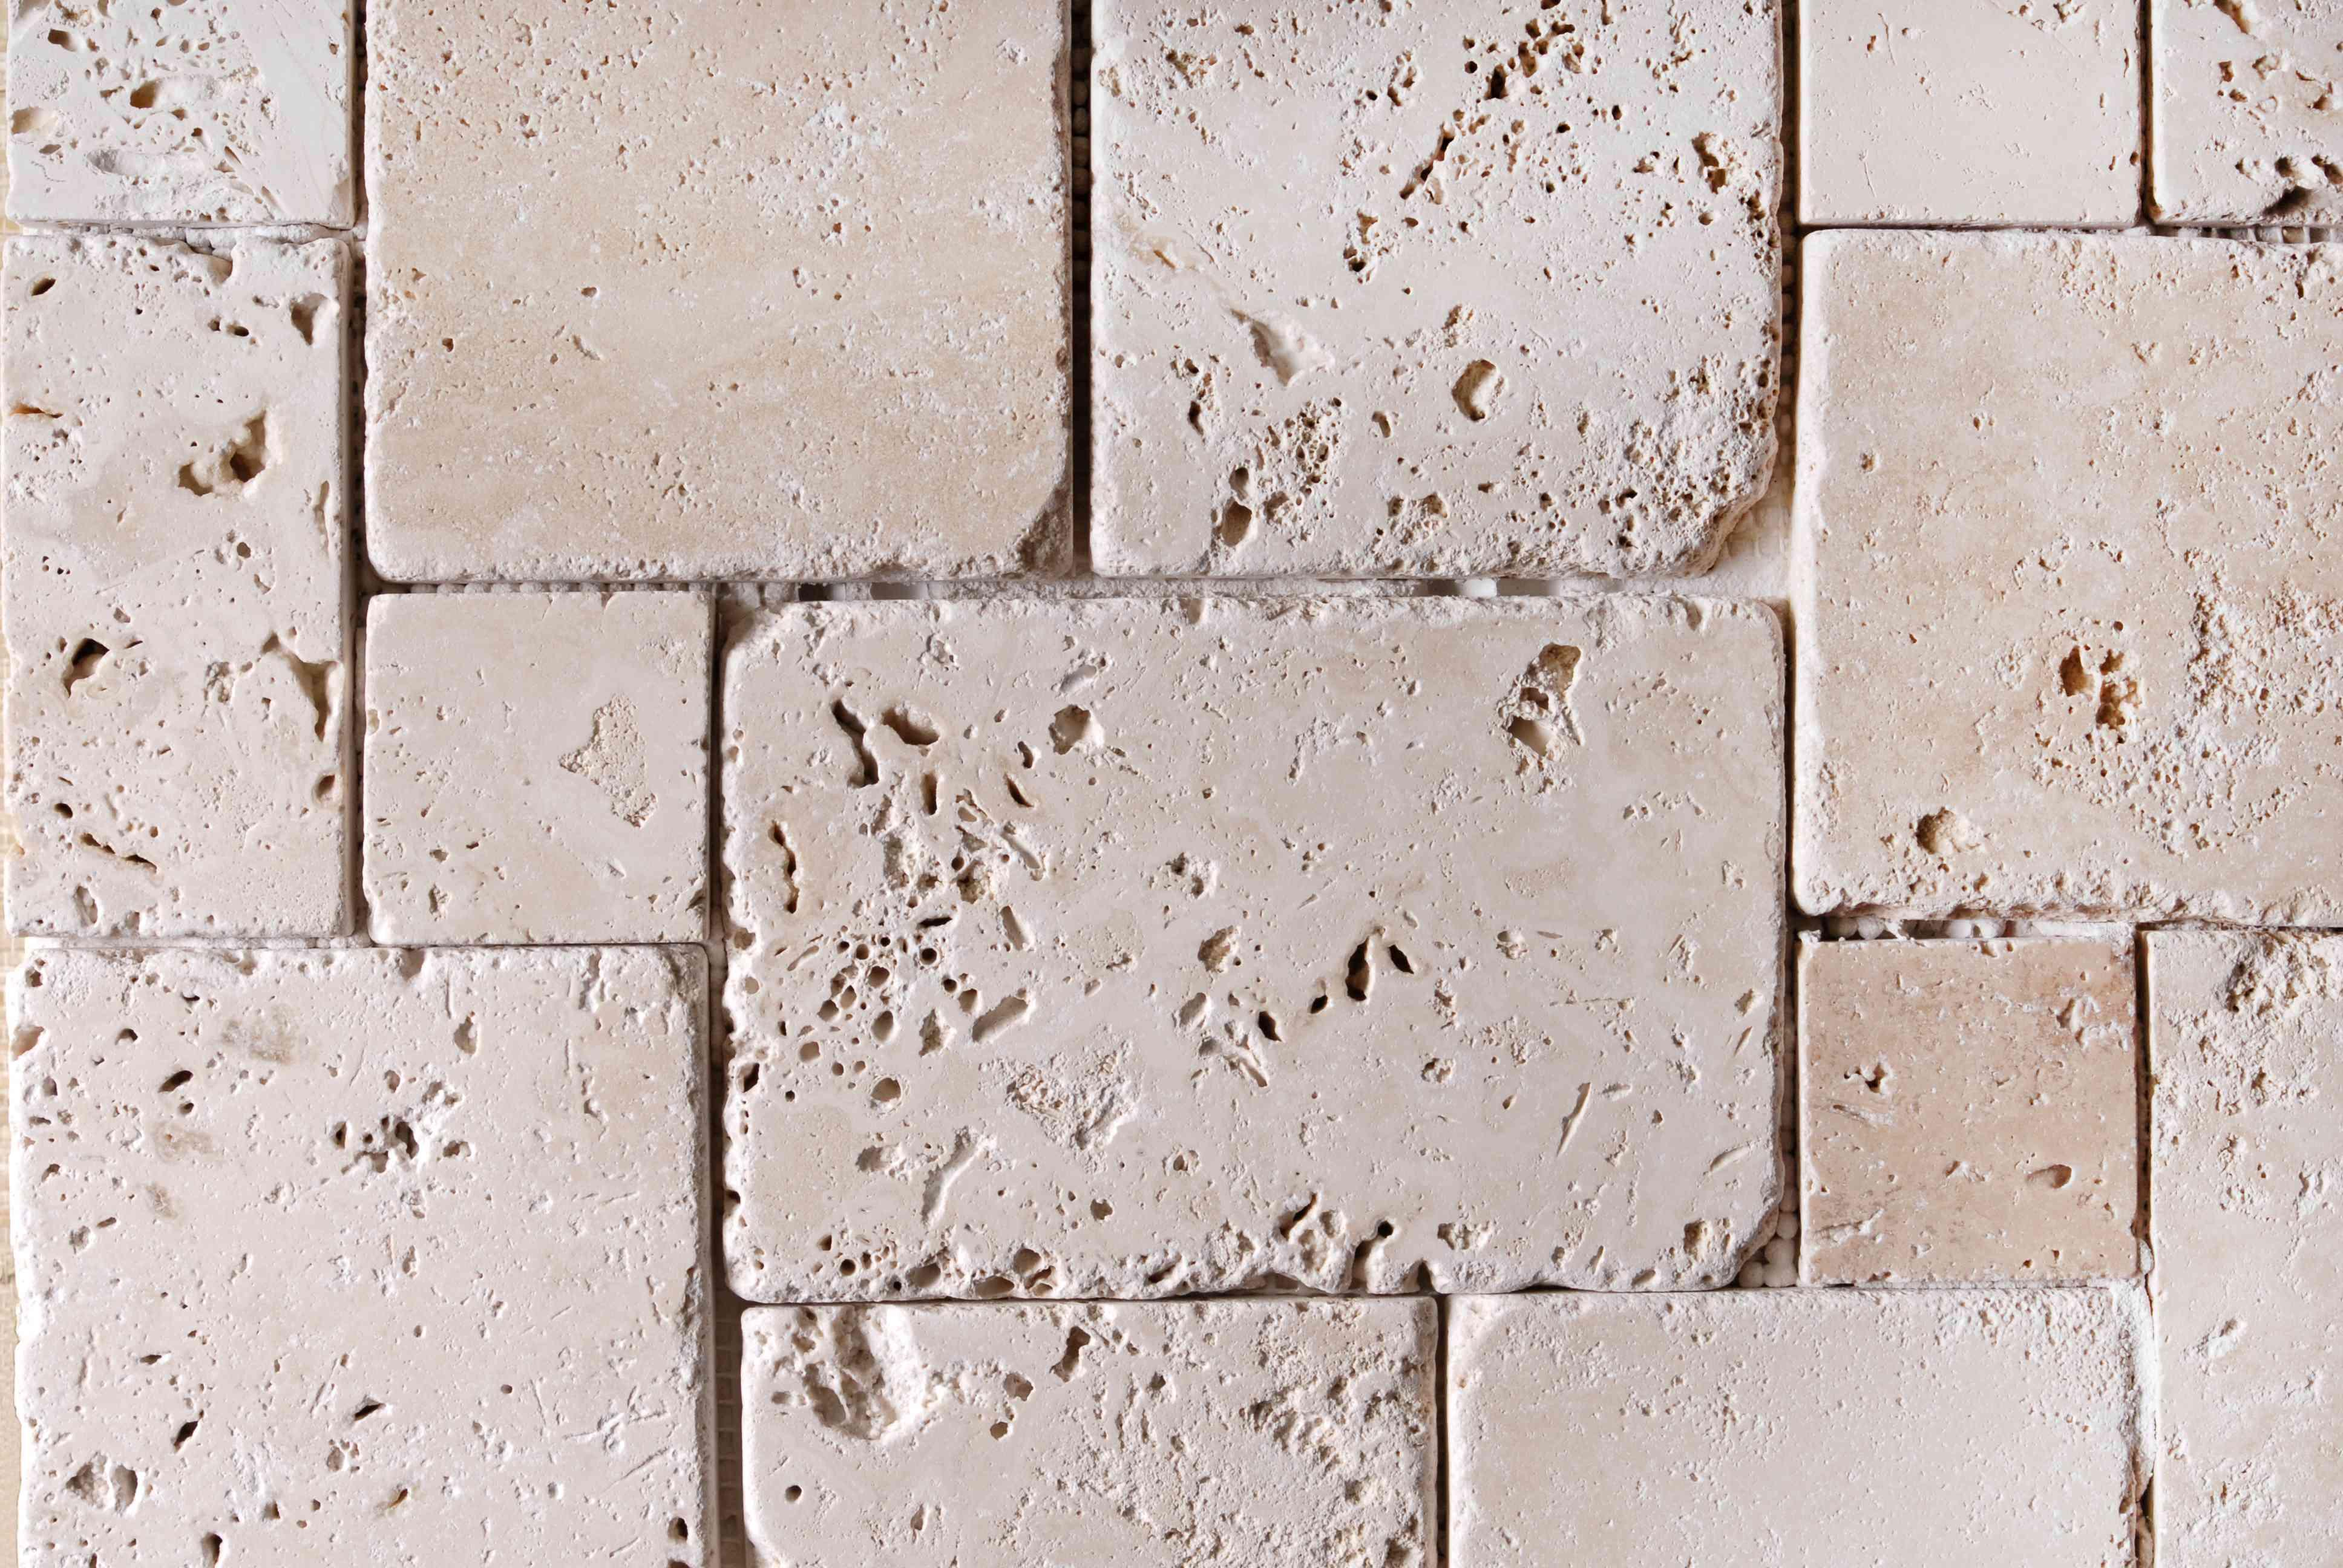 travertine tiles texture background